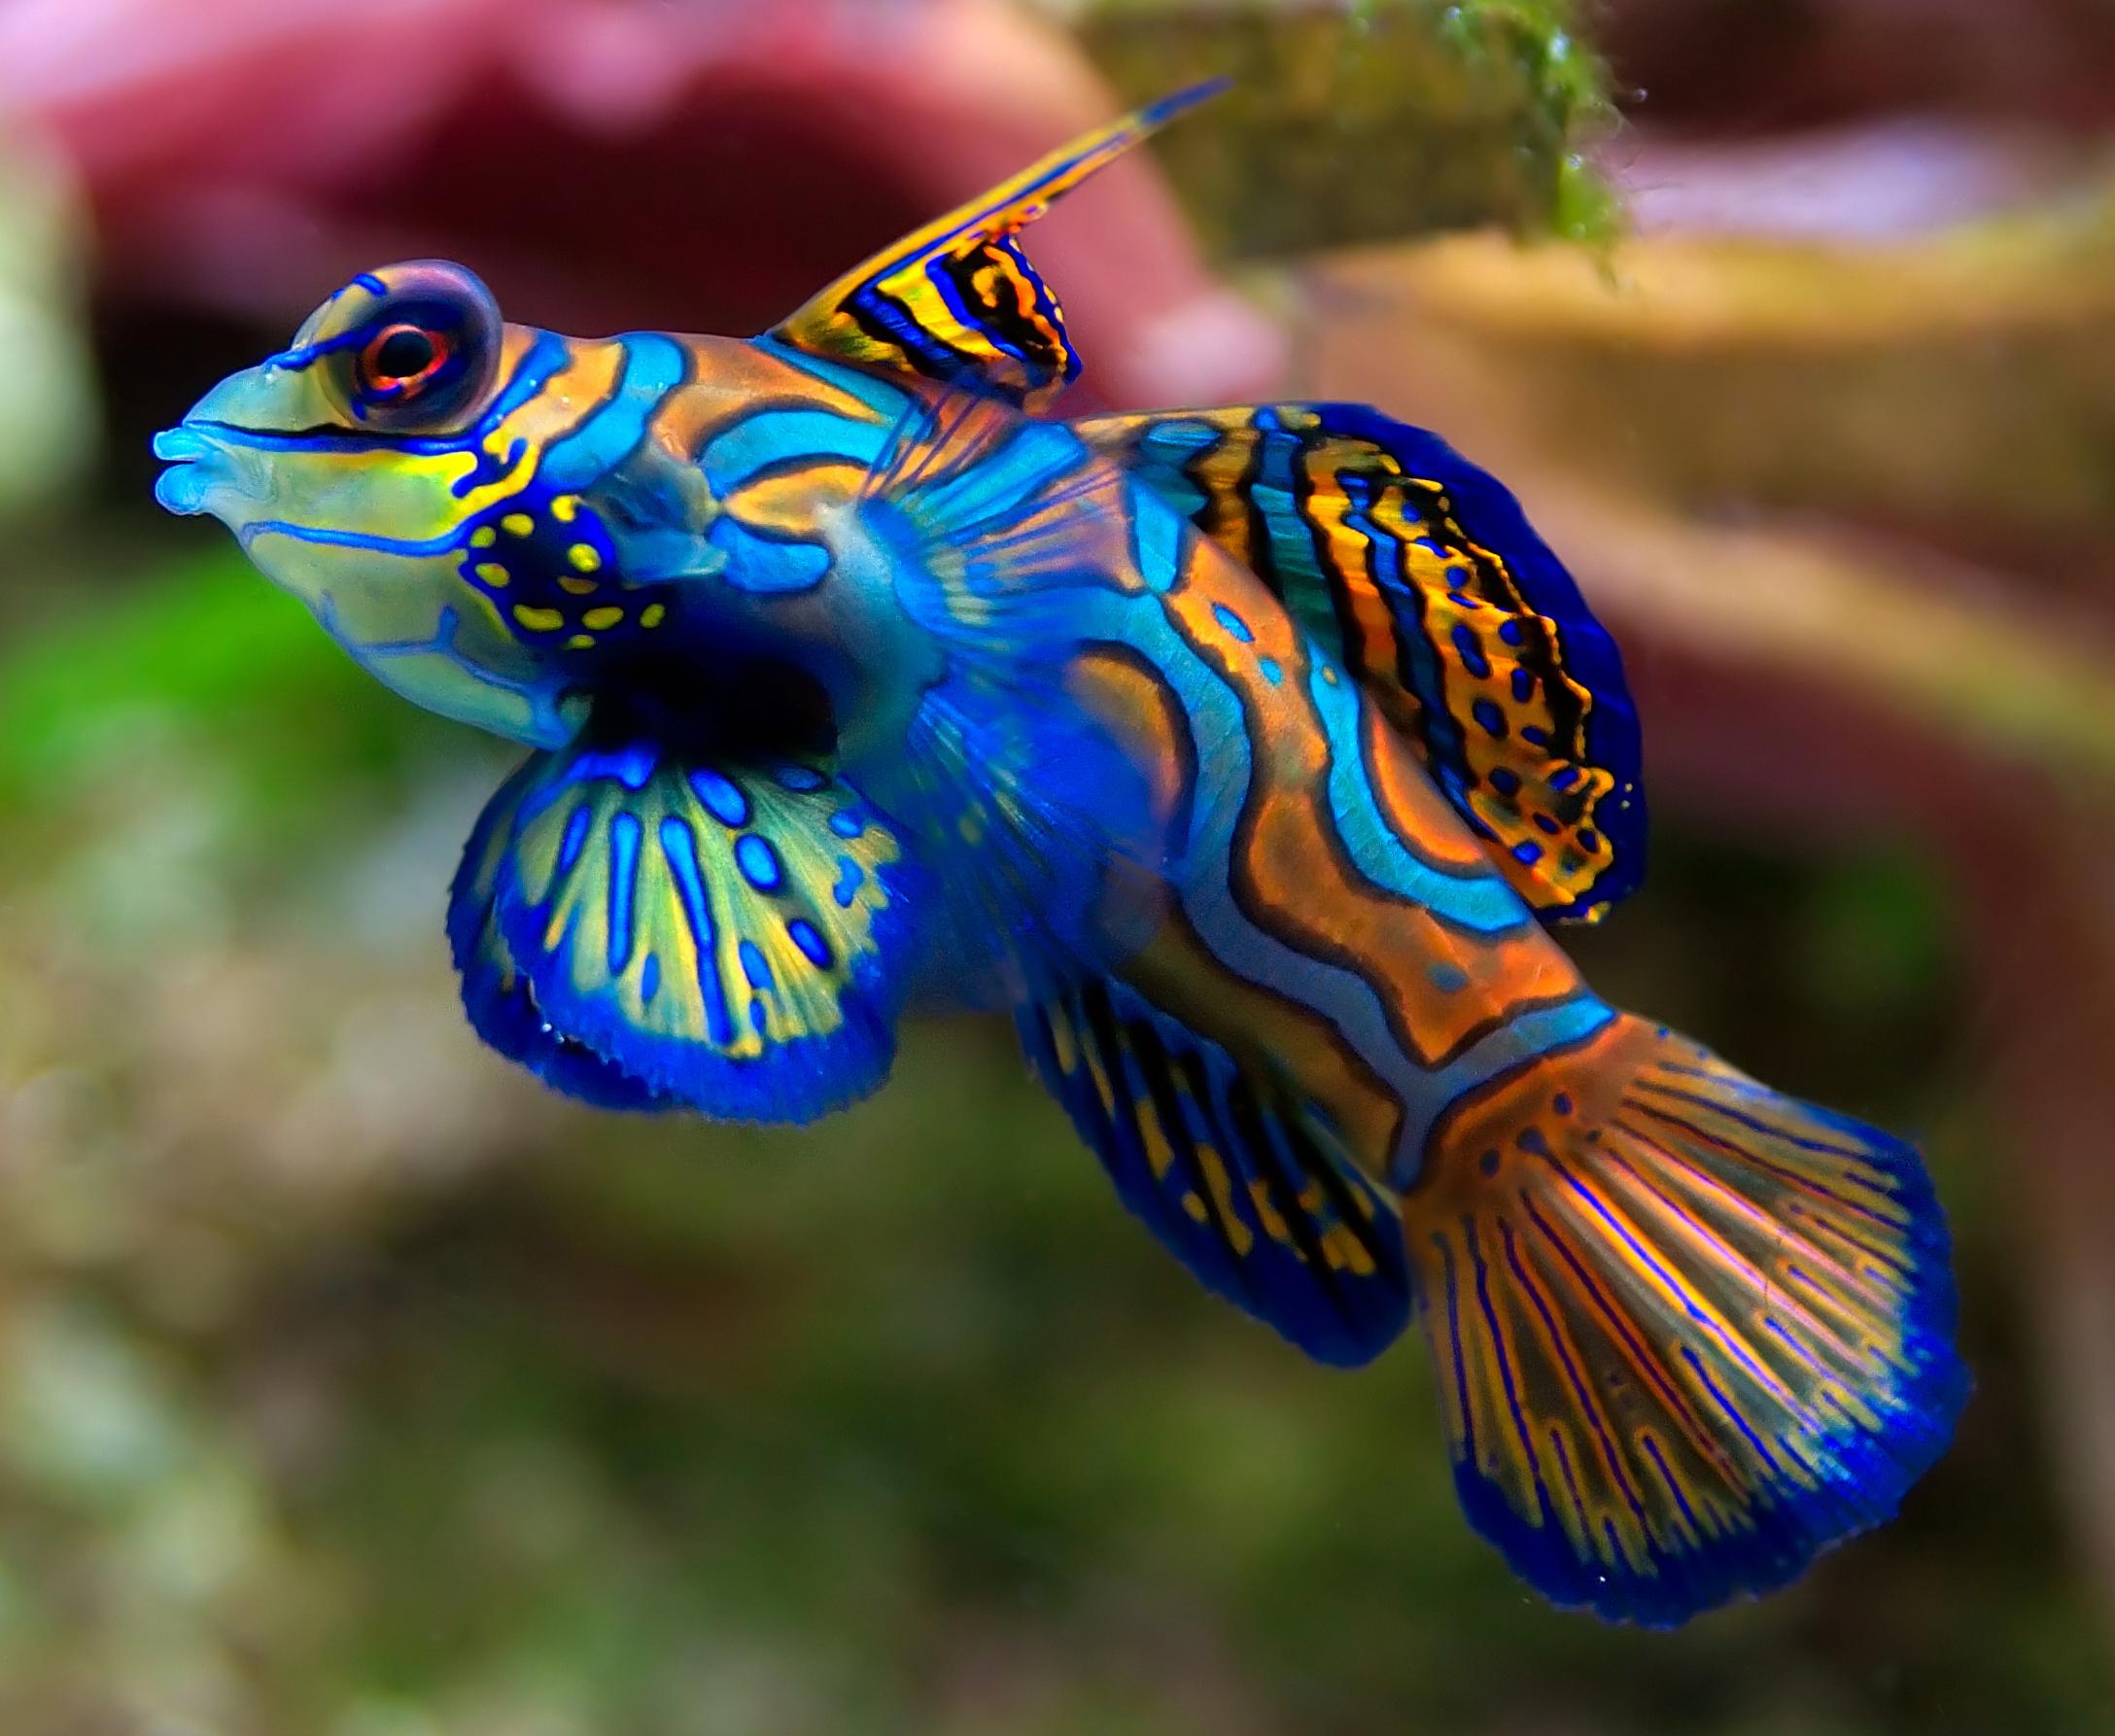 Top 5 Most Colorful Aquarium Fish Fpsbutest